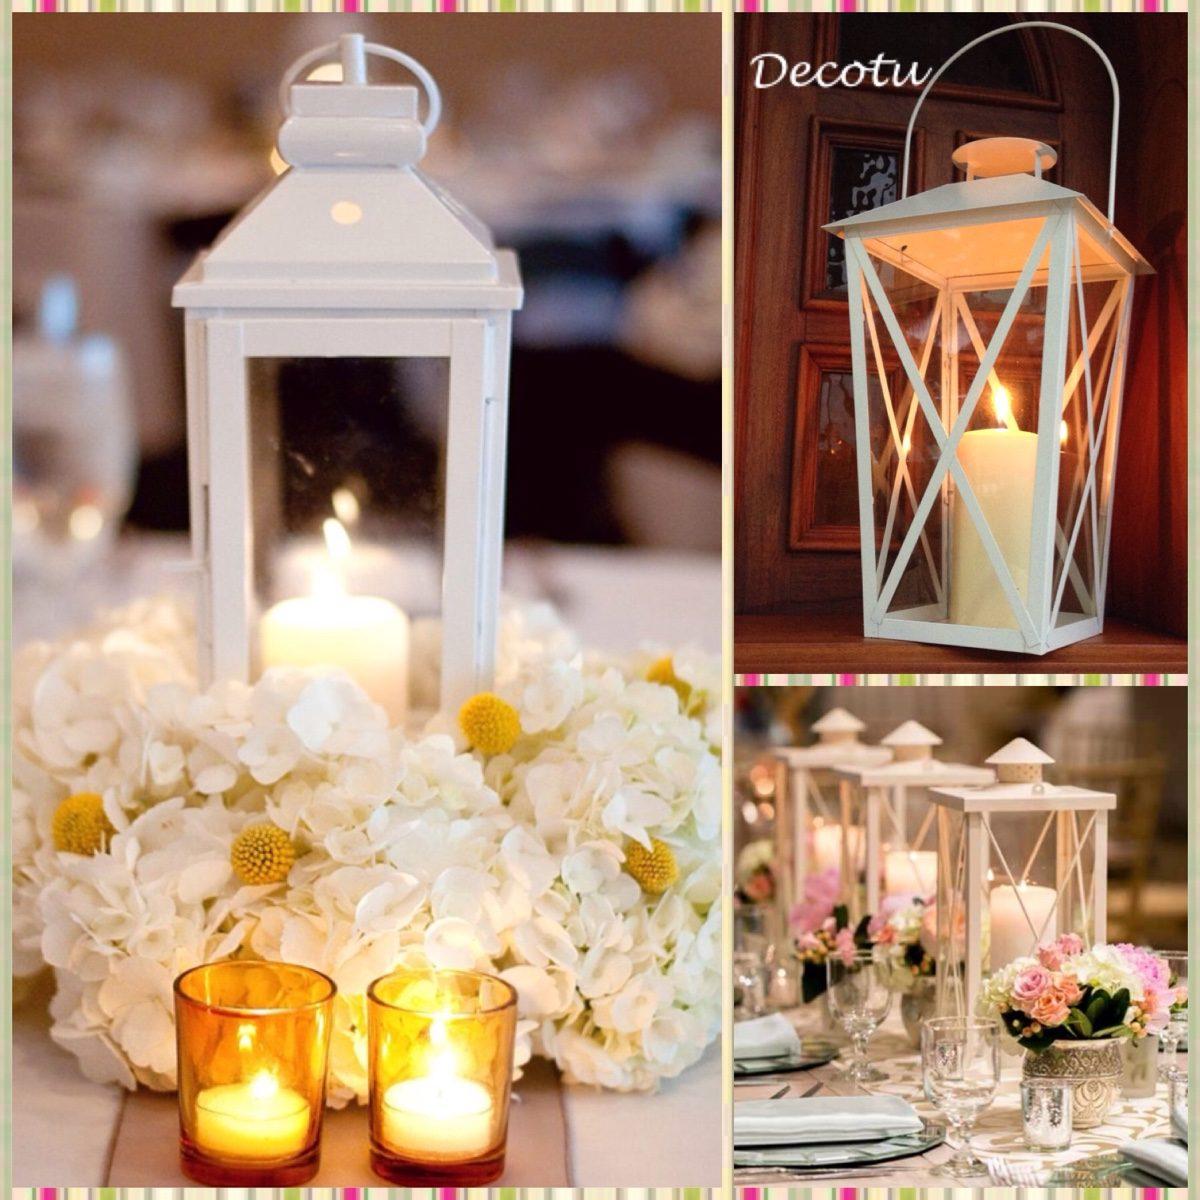 Farol candelabro porta vela decoraci n recuerdo boda - Decoracion de velas para bautizo ...